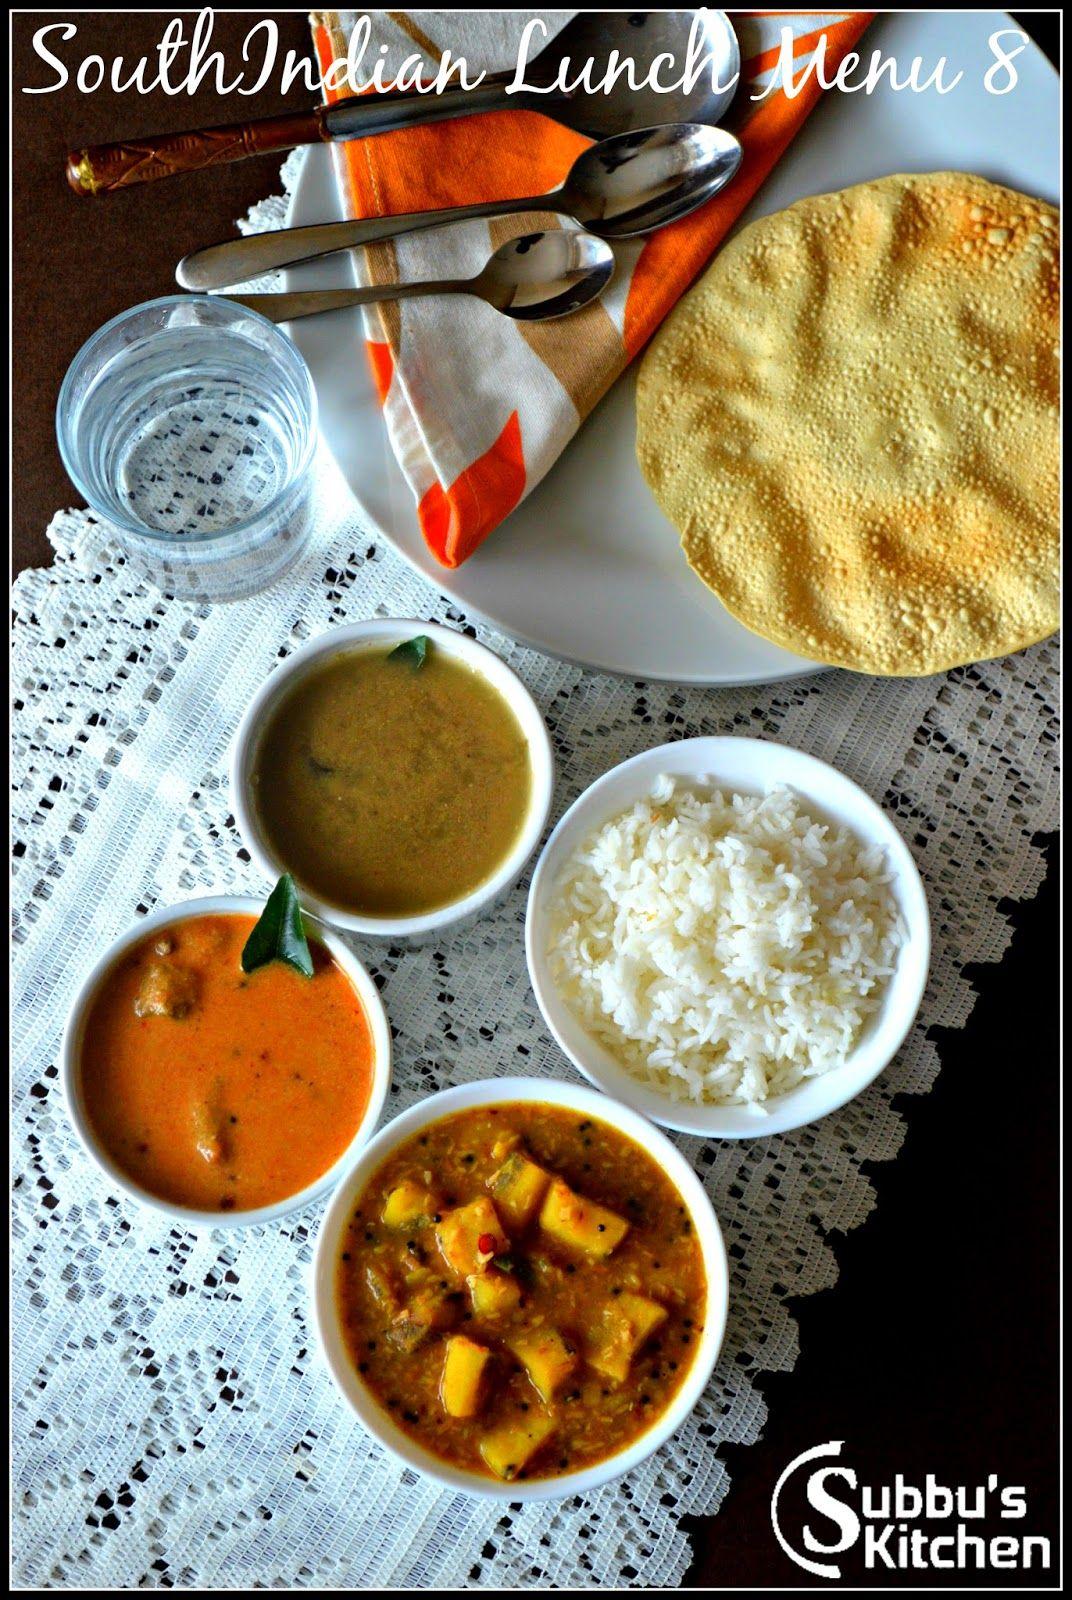 South Indian Lunch Menu 8 Thengai Araitha Kuzhambu Vazhakaai Puliyita Kootu Poondu Rasam And Pappad Lunch Menu Indian Veg Recipes Indian Food Recipes